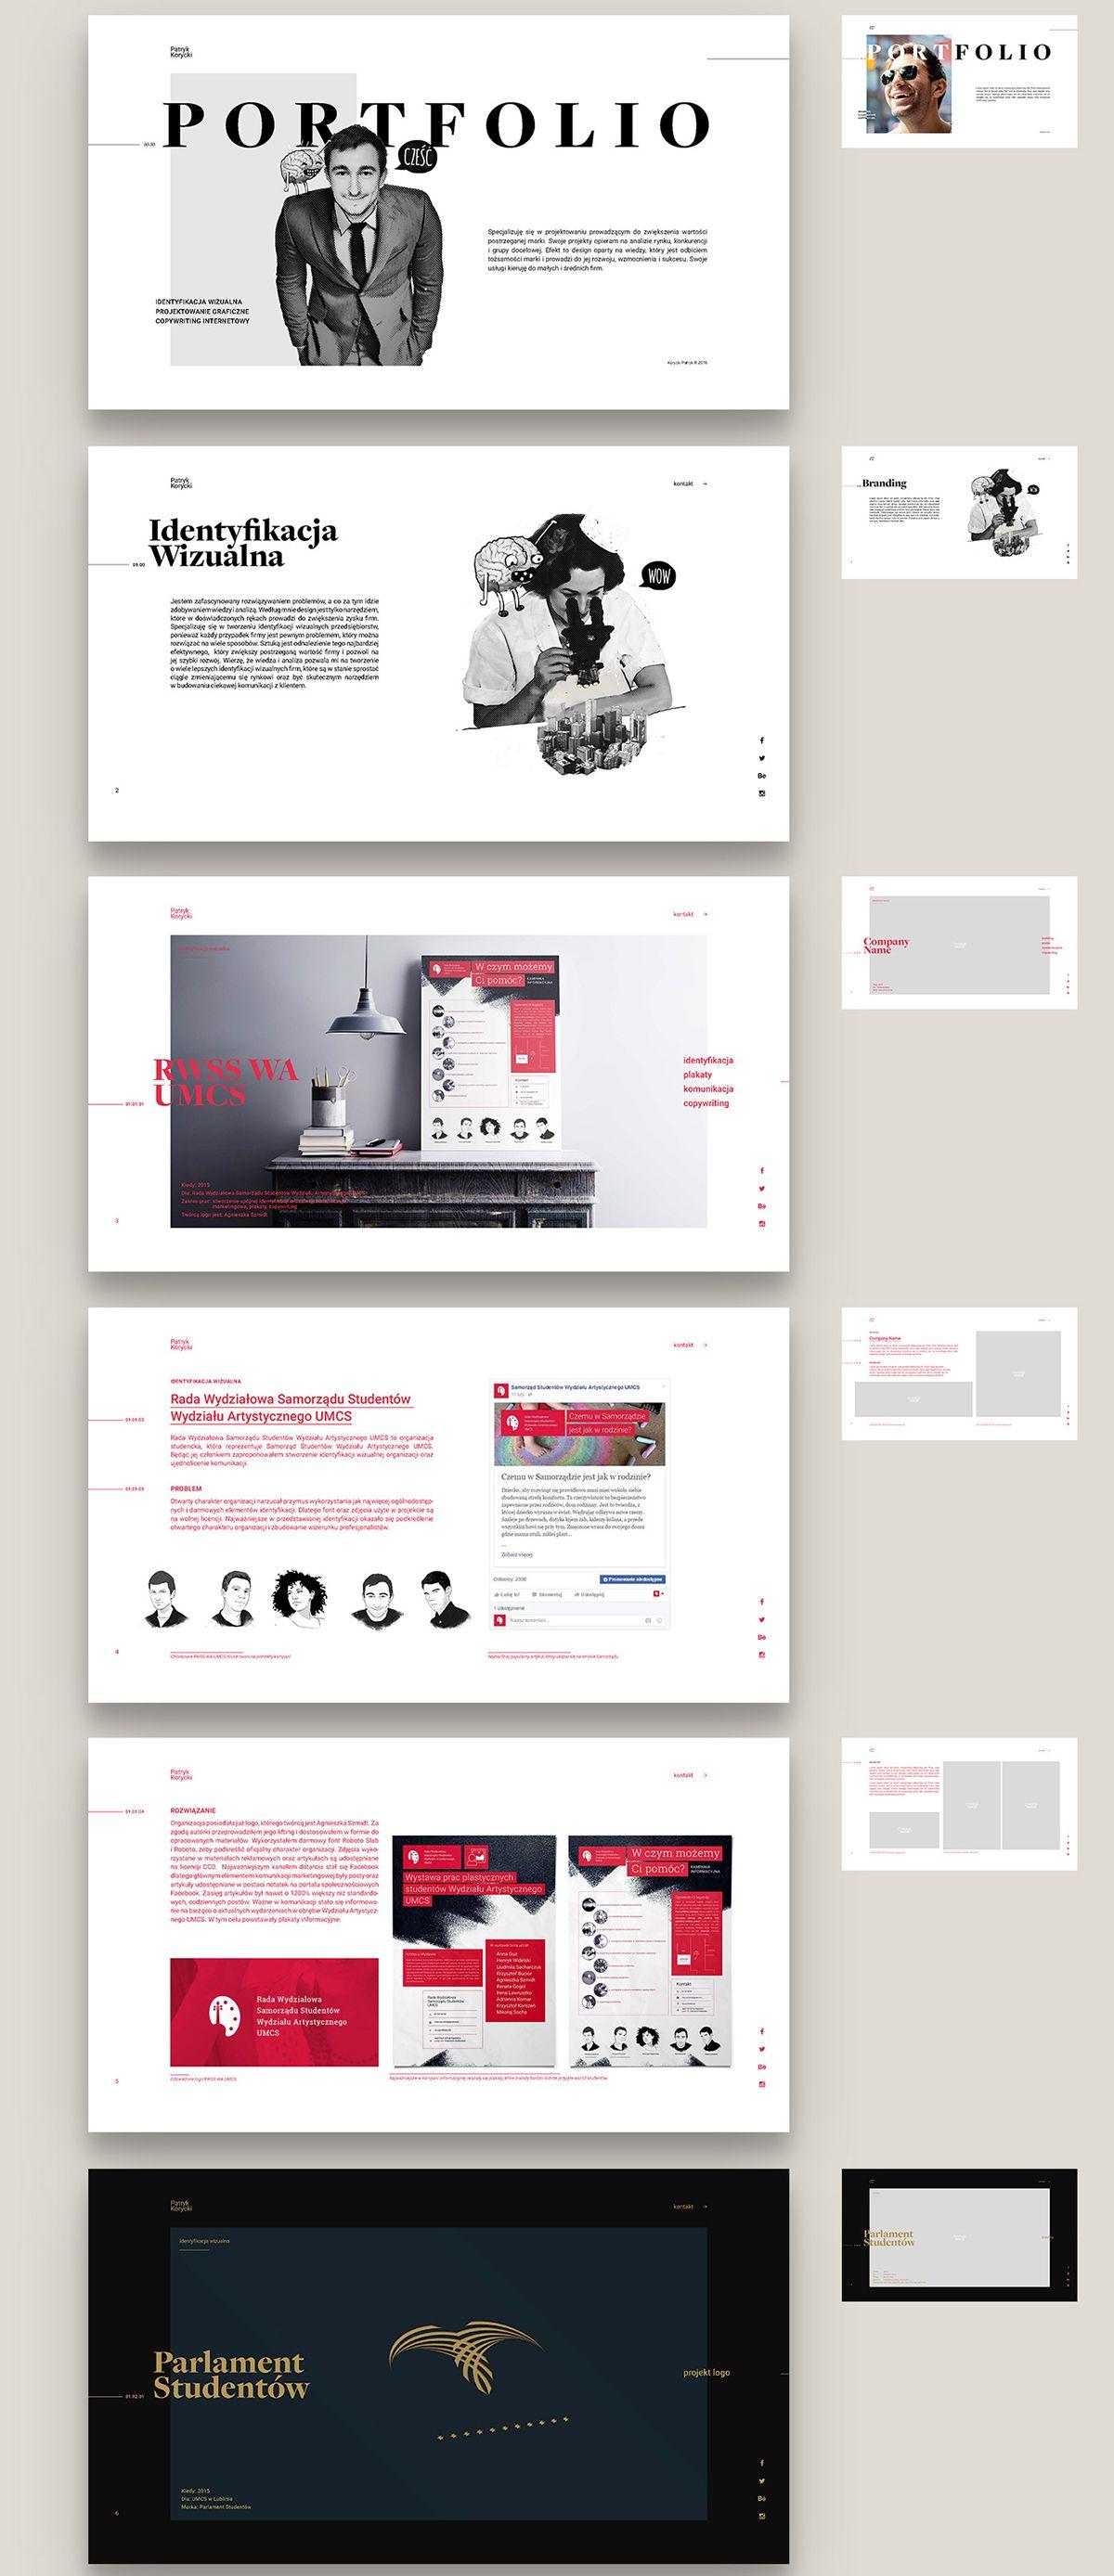 10 plantillas en descarga libre para tu portafolio creativo ...